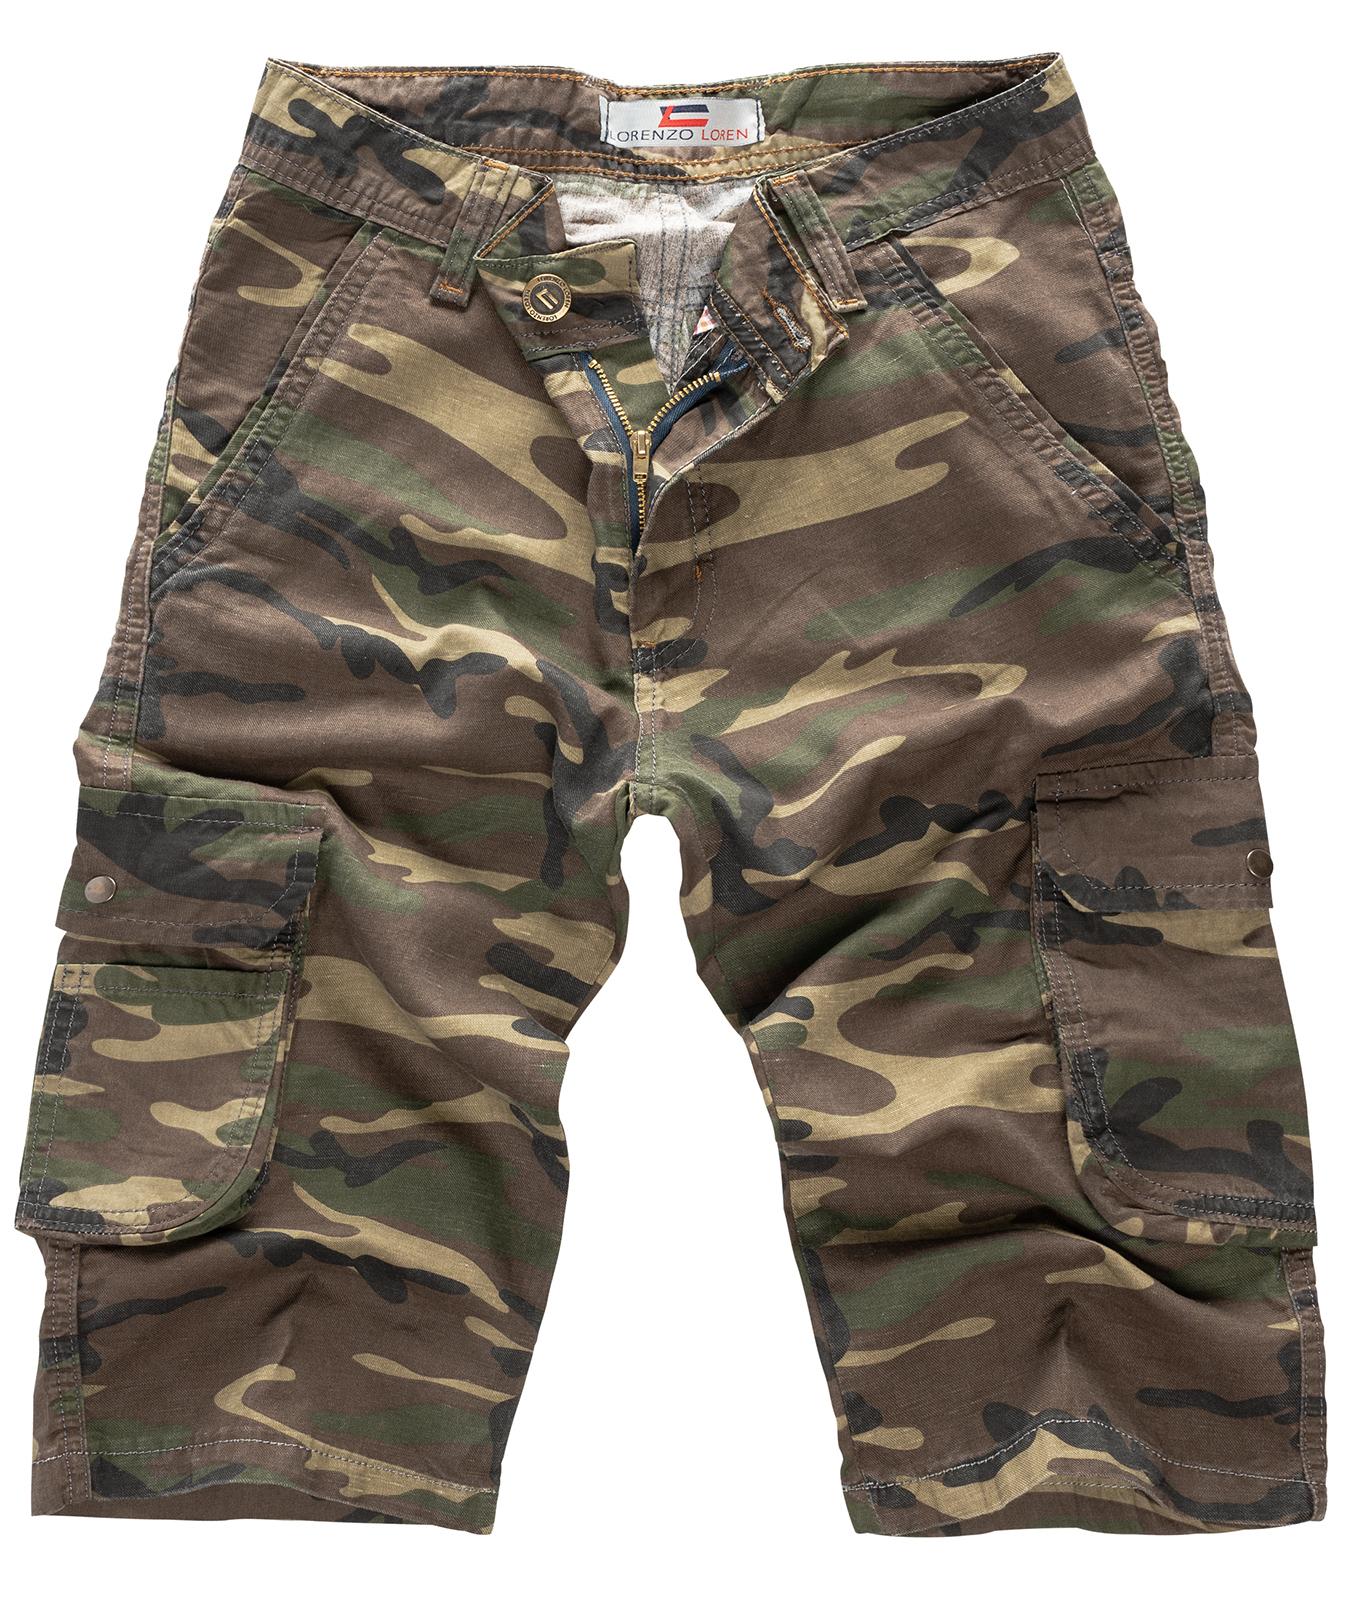 rock creek herren bermuda hosen army hose shorts jeans kurze hose camouflage m5 ebay. Black Bedroom Furniture Sets. Home Design Ideas